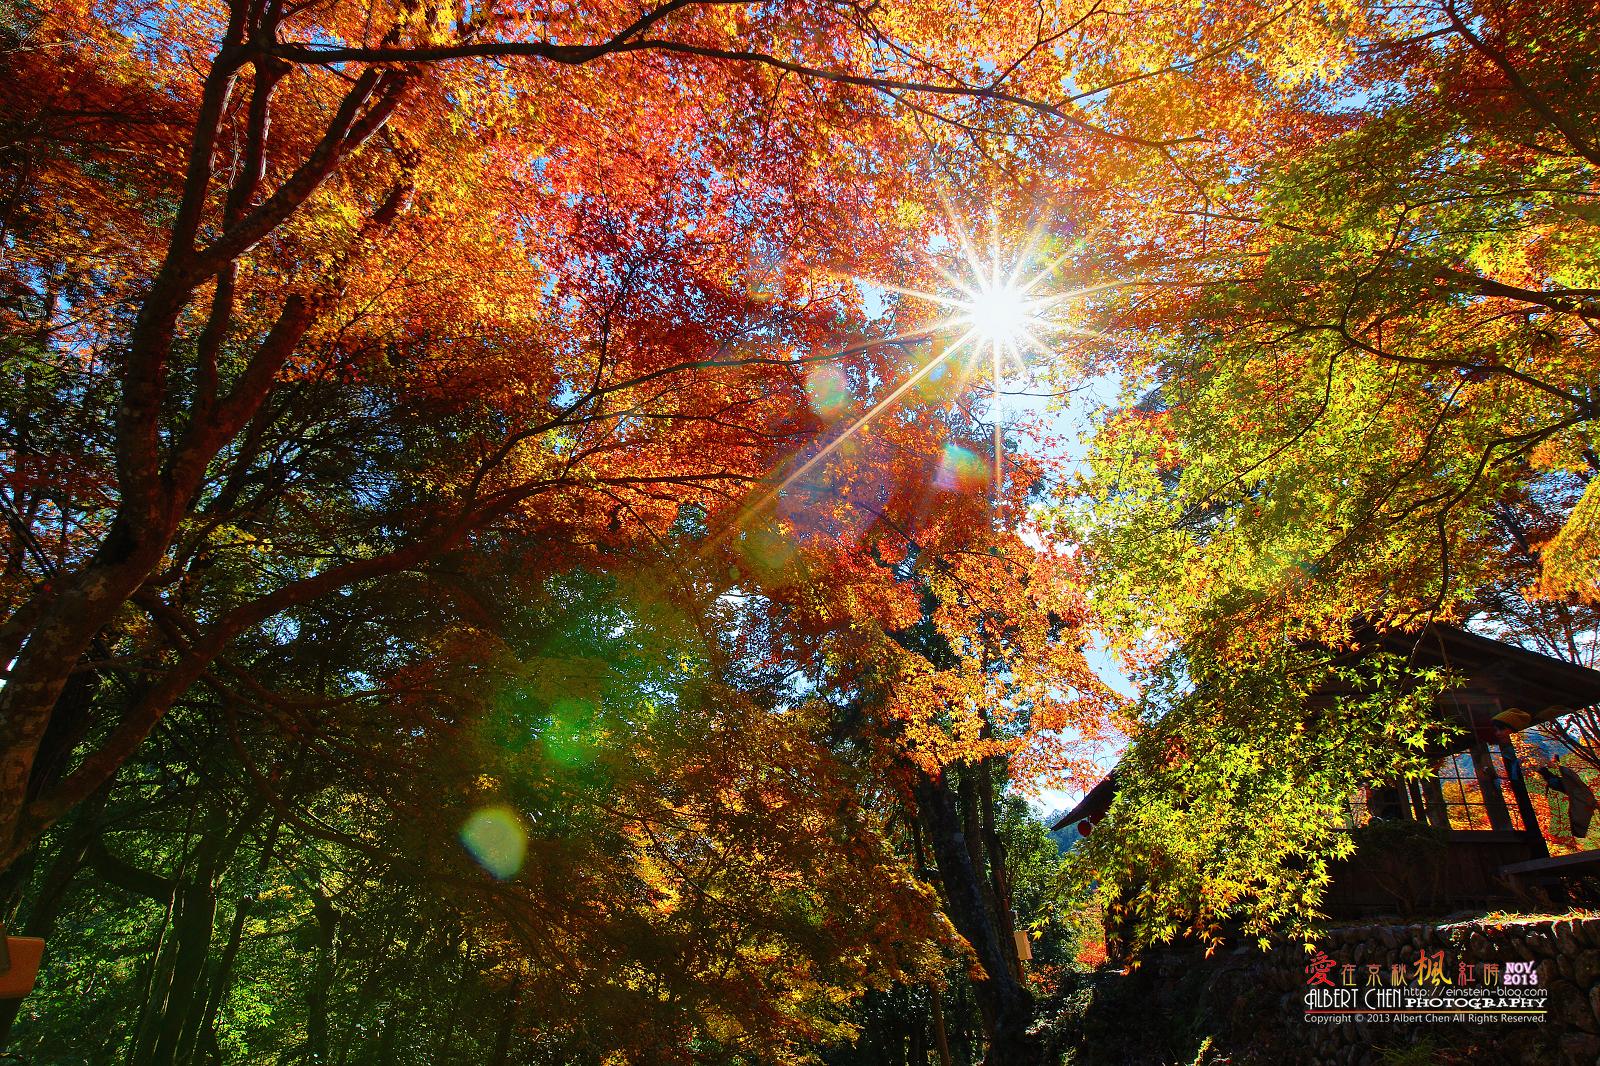 2013-11-19 11.00.21IMG_0236r